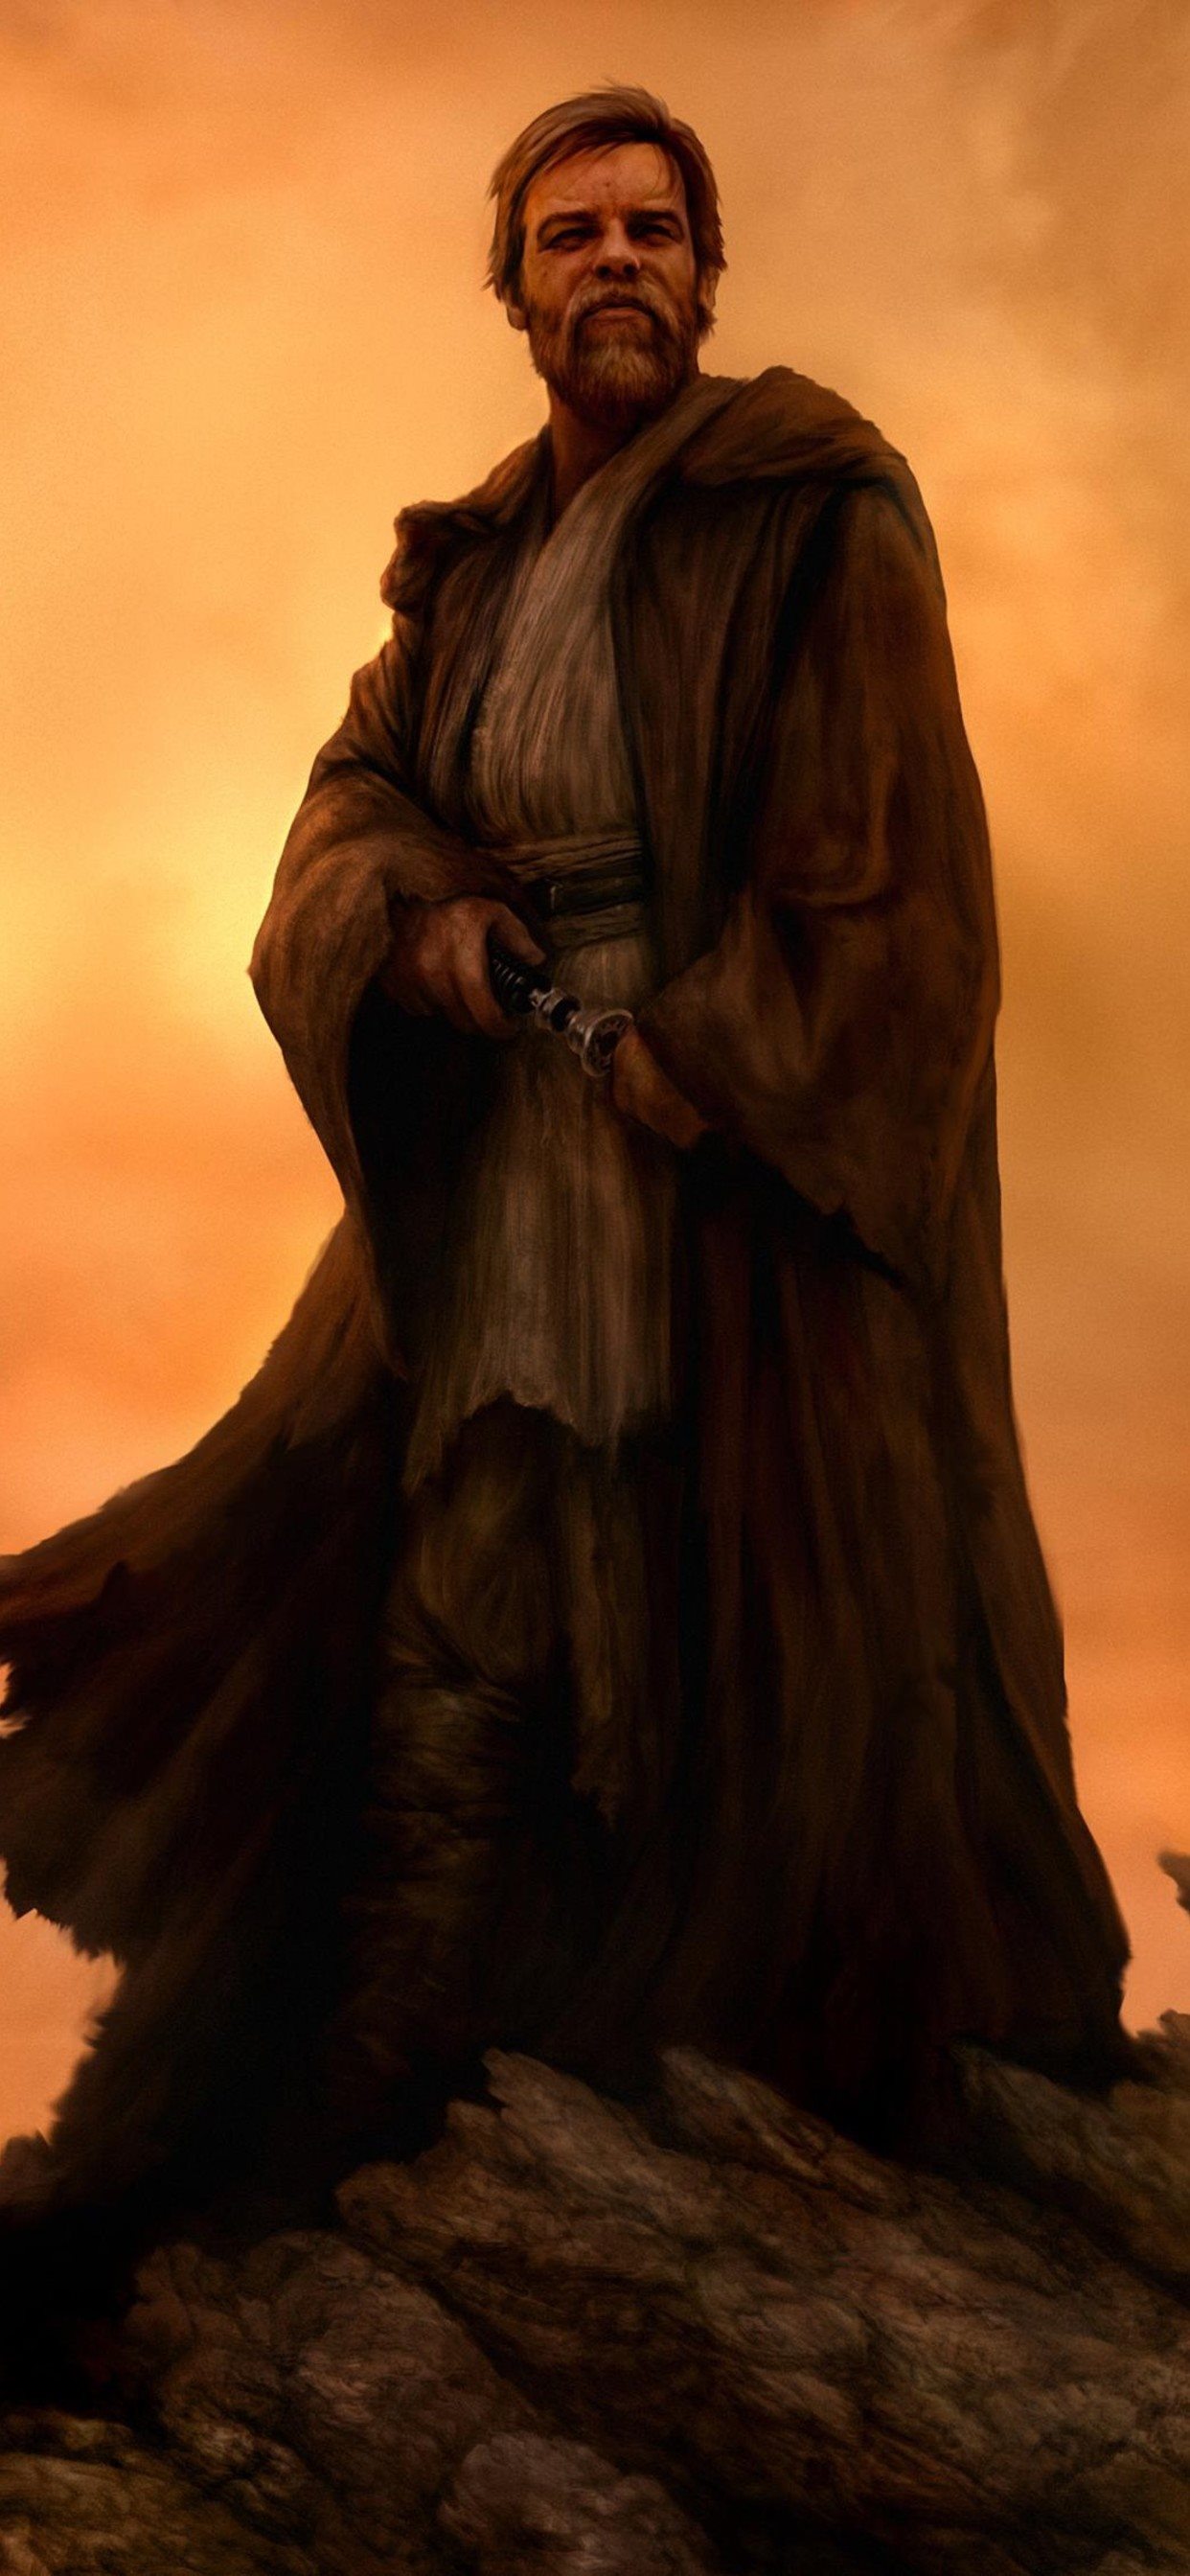 Obi Wan Kenobi Star Wars 4k Iphone X Wallpapers Free Download